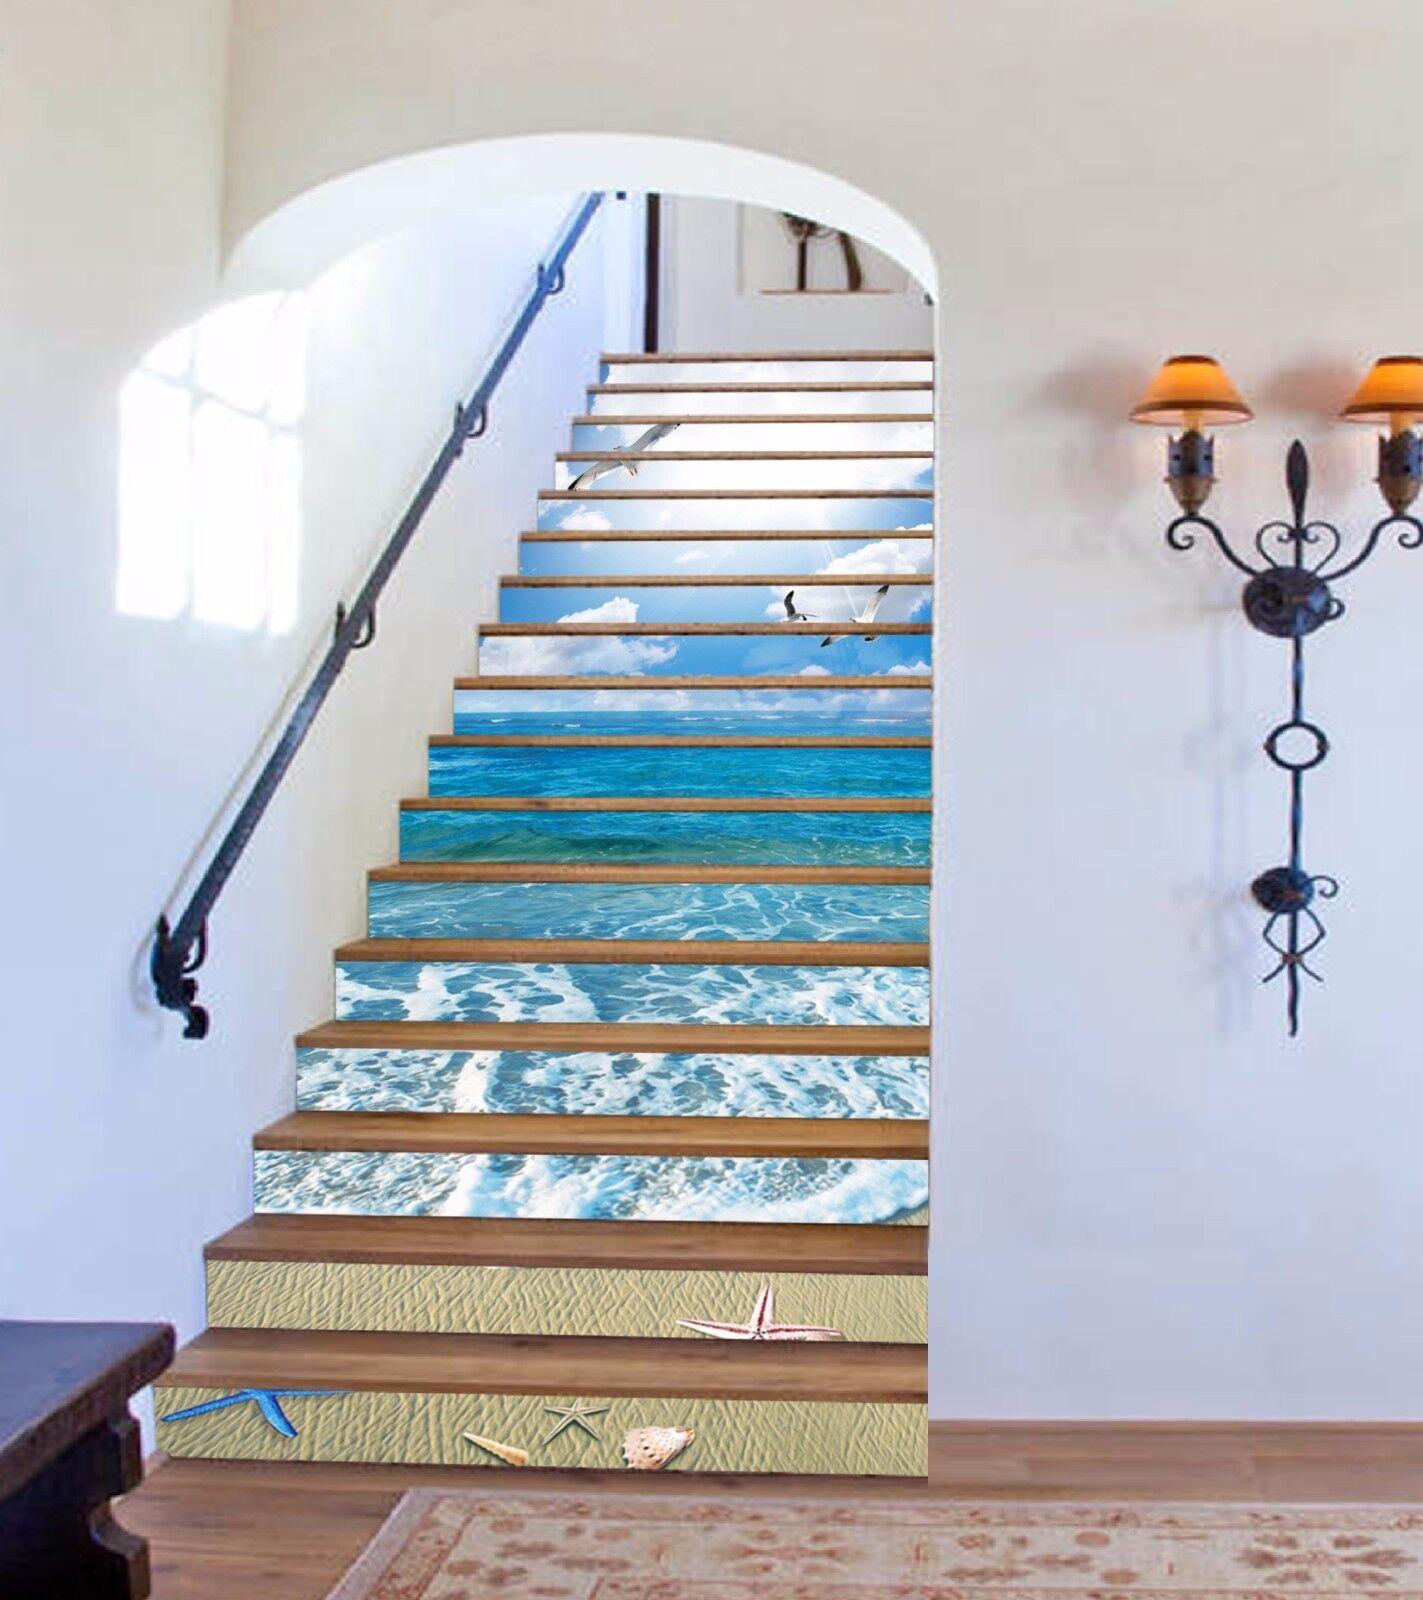 3D Sky Sea Bird 630 Stair Risers Decoration Photo Mural Vinyl Decal Wallpaper UK